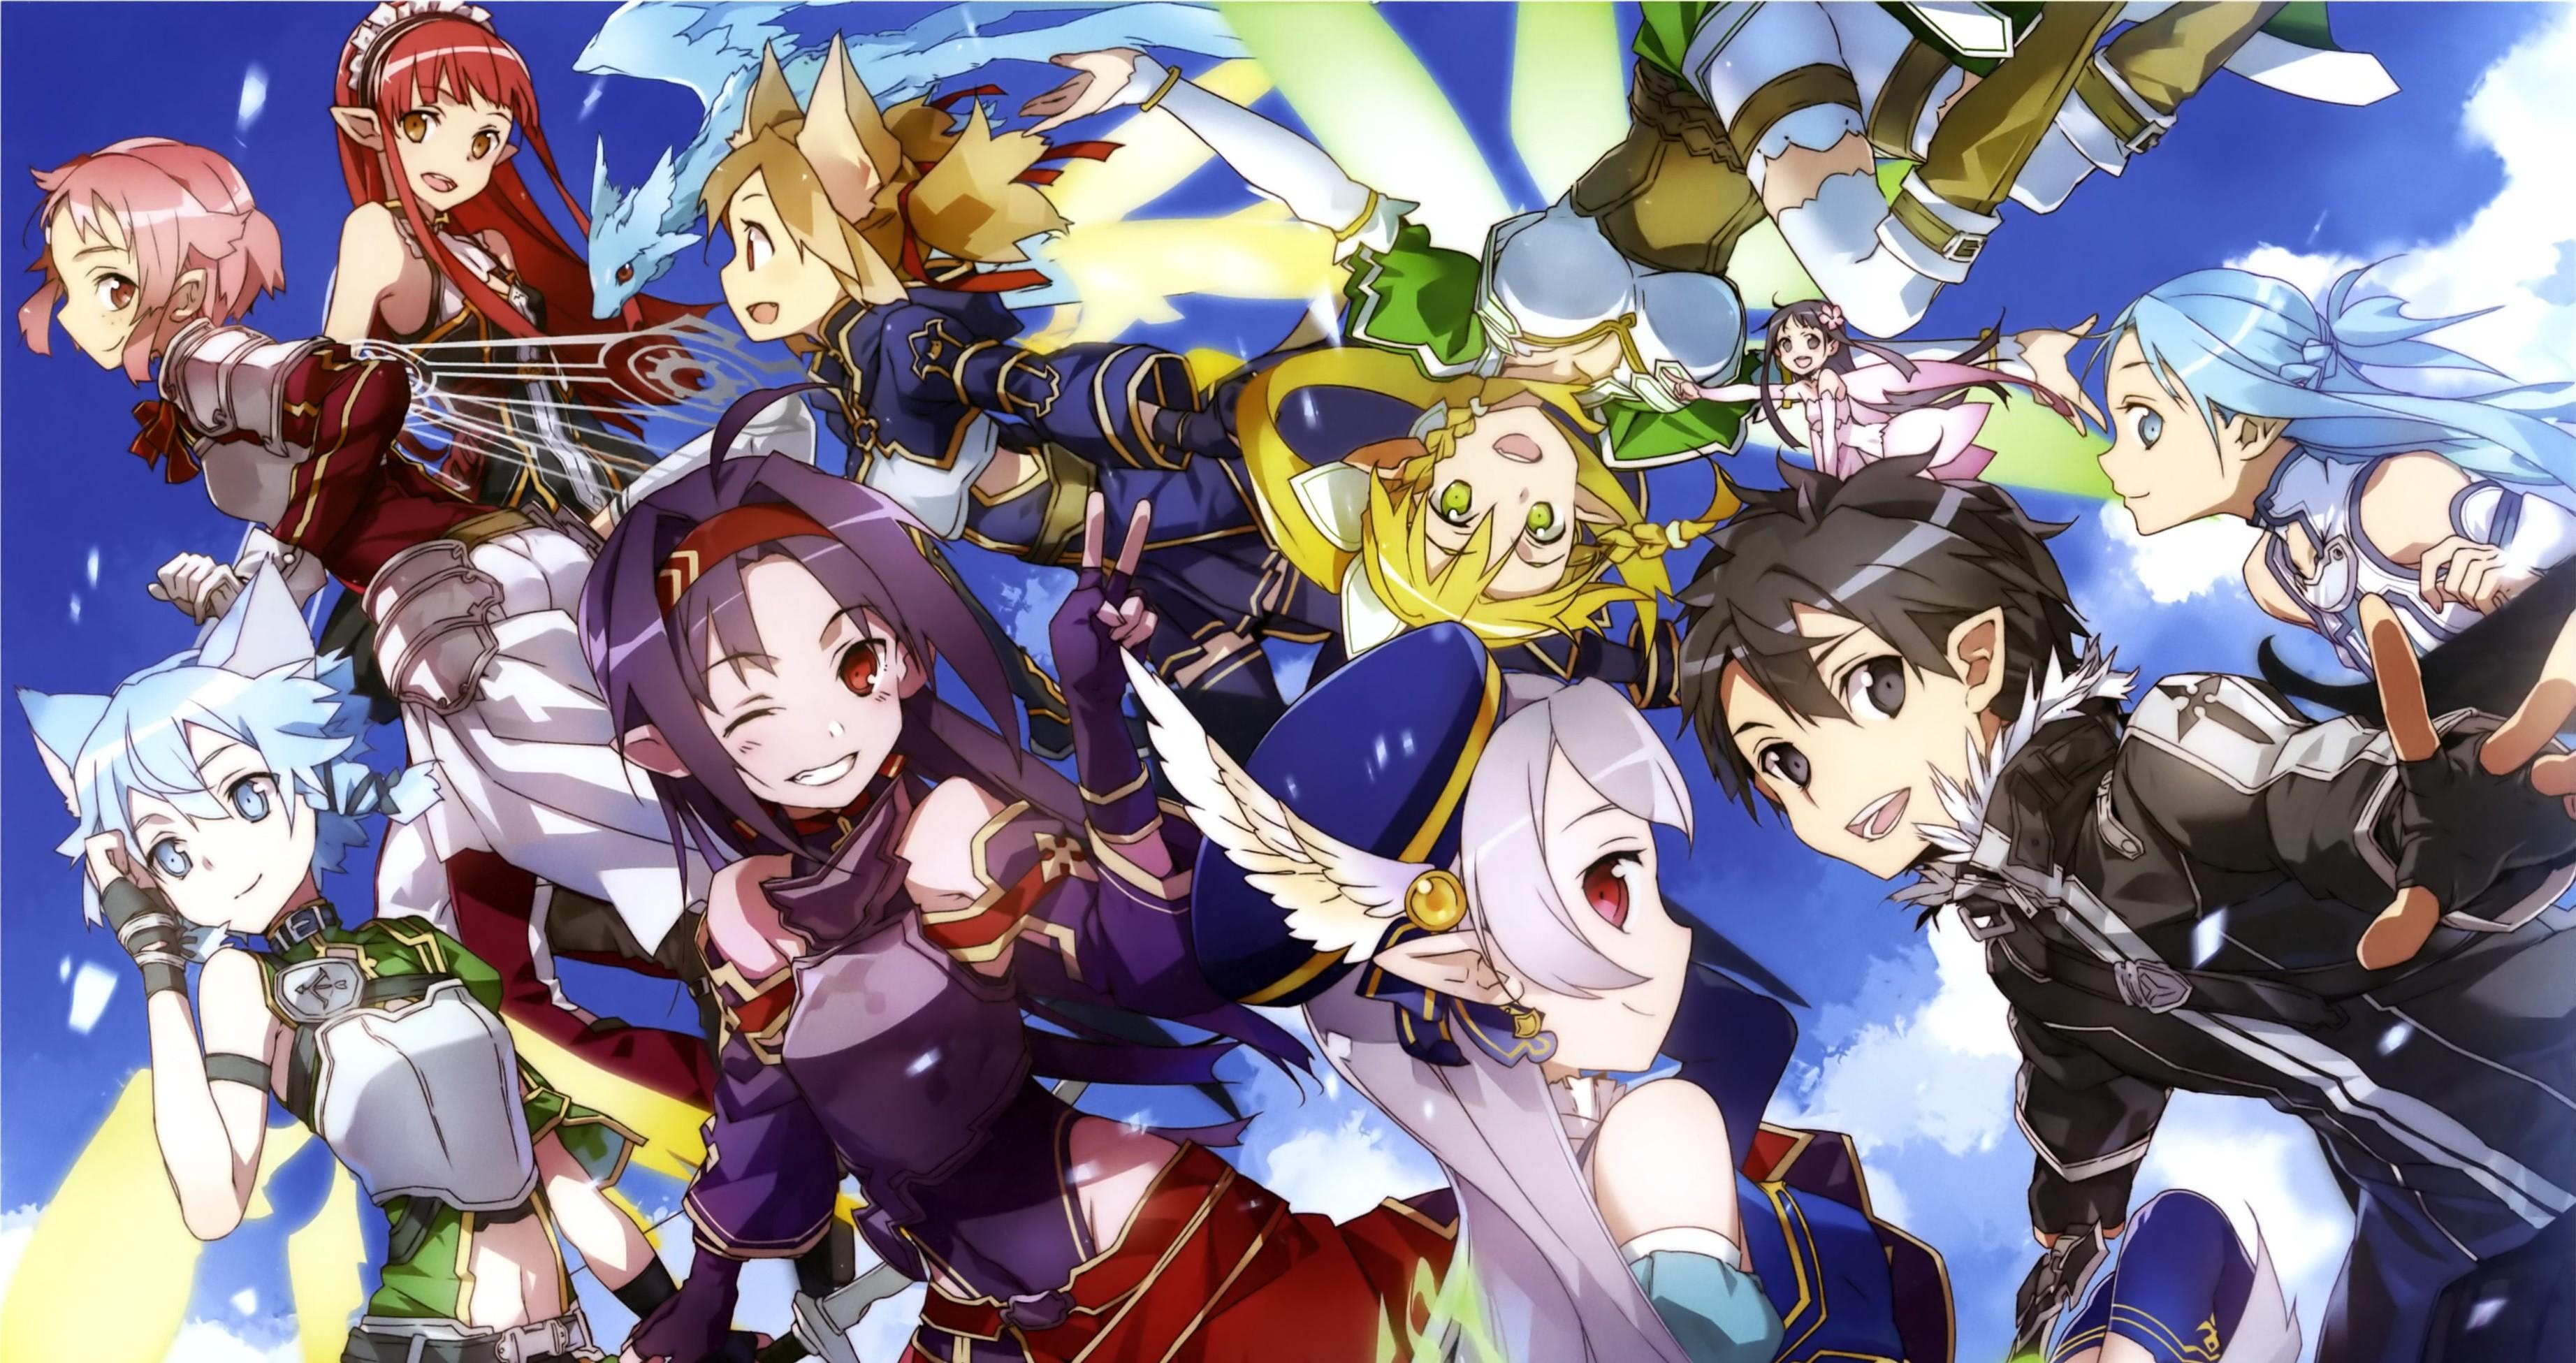 HD Wallpaper | Hintergrund ID:671991. Anime Sword Art Online II